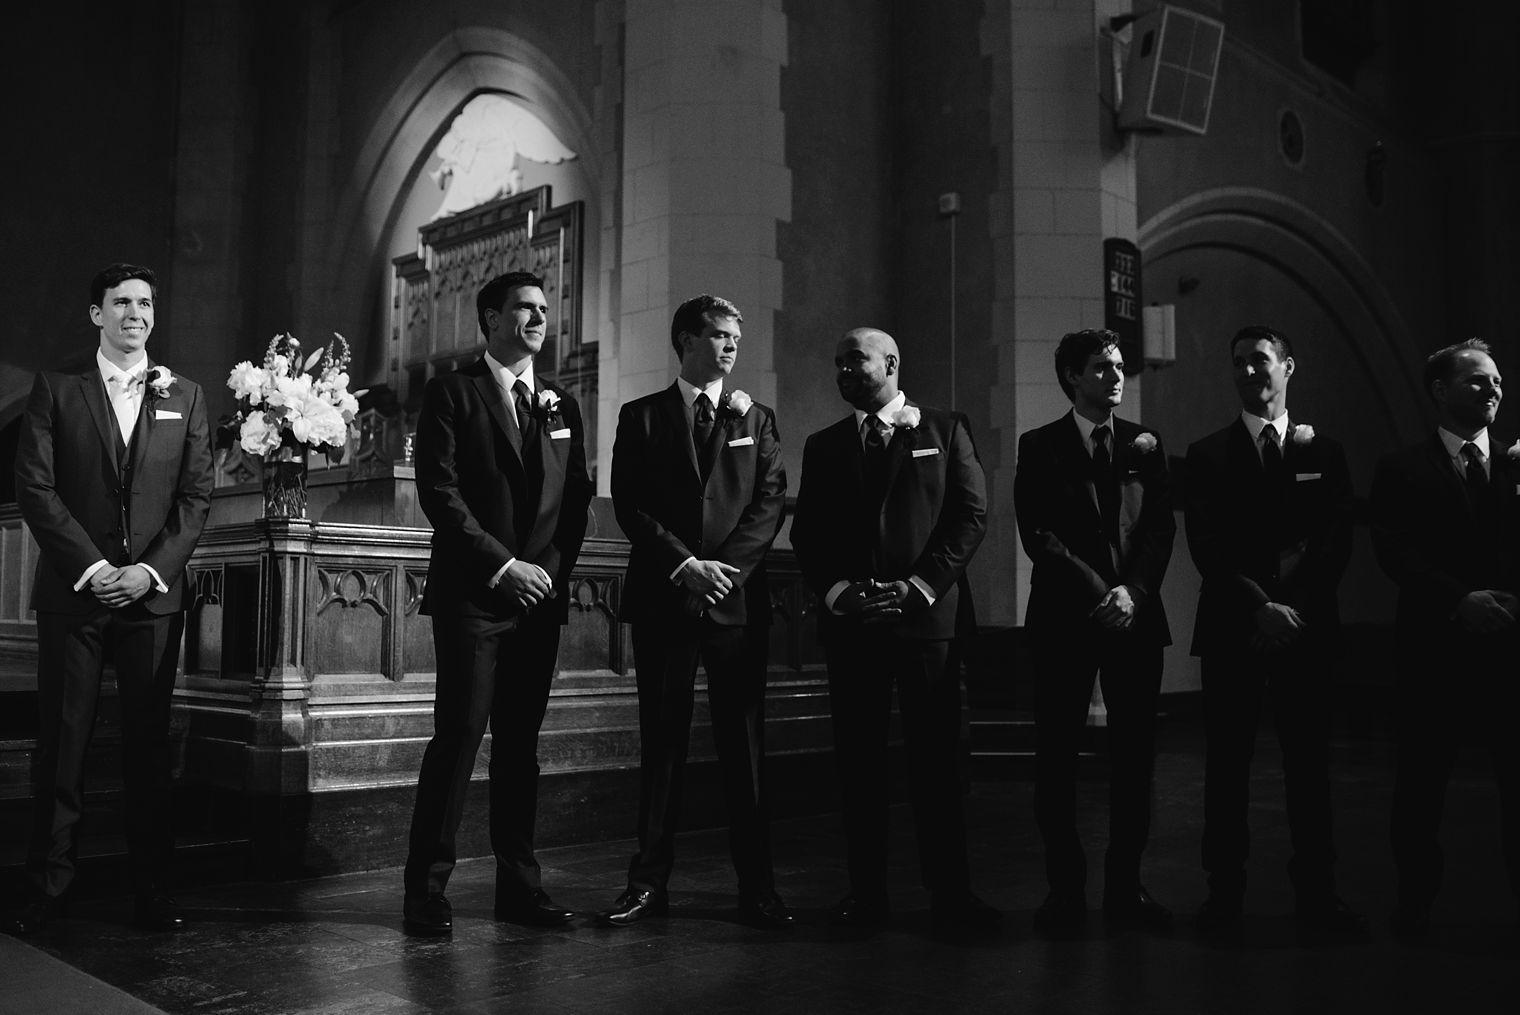 groomsmen waiting during wedding ceremony